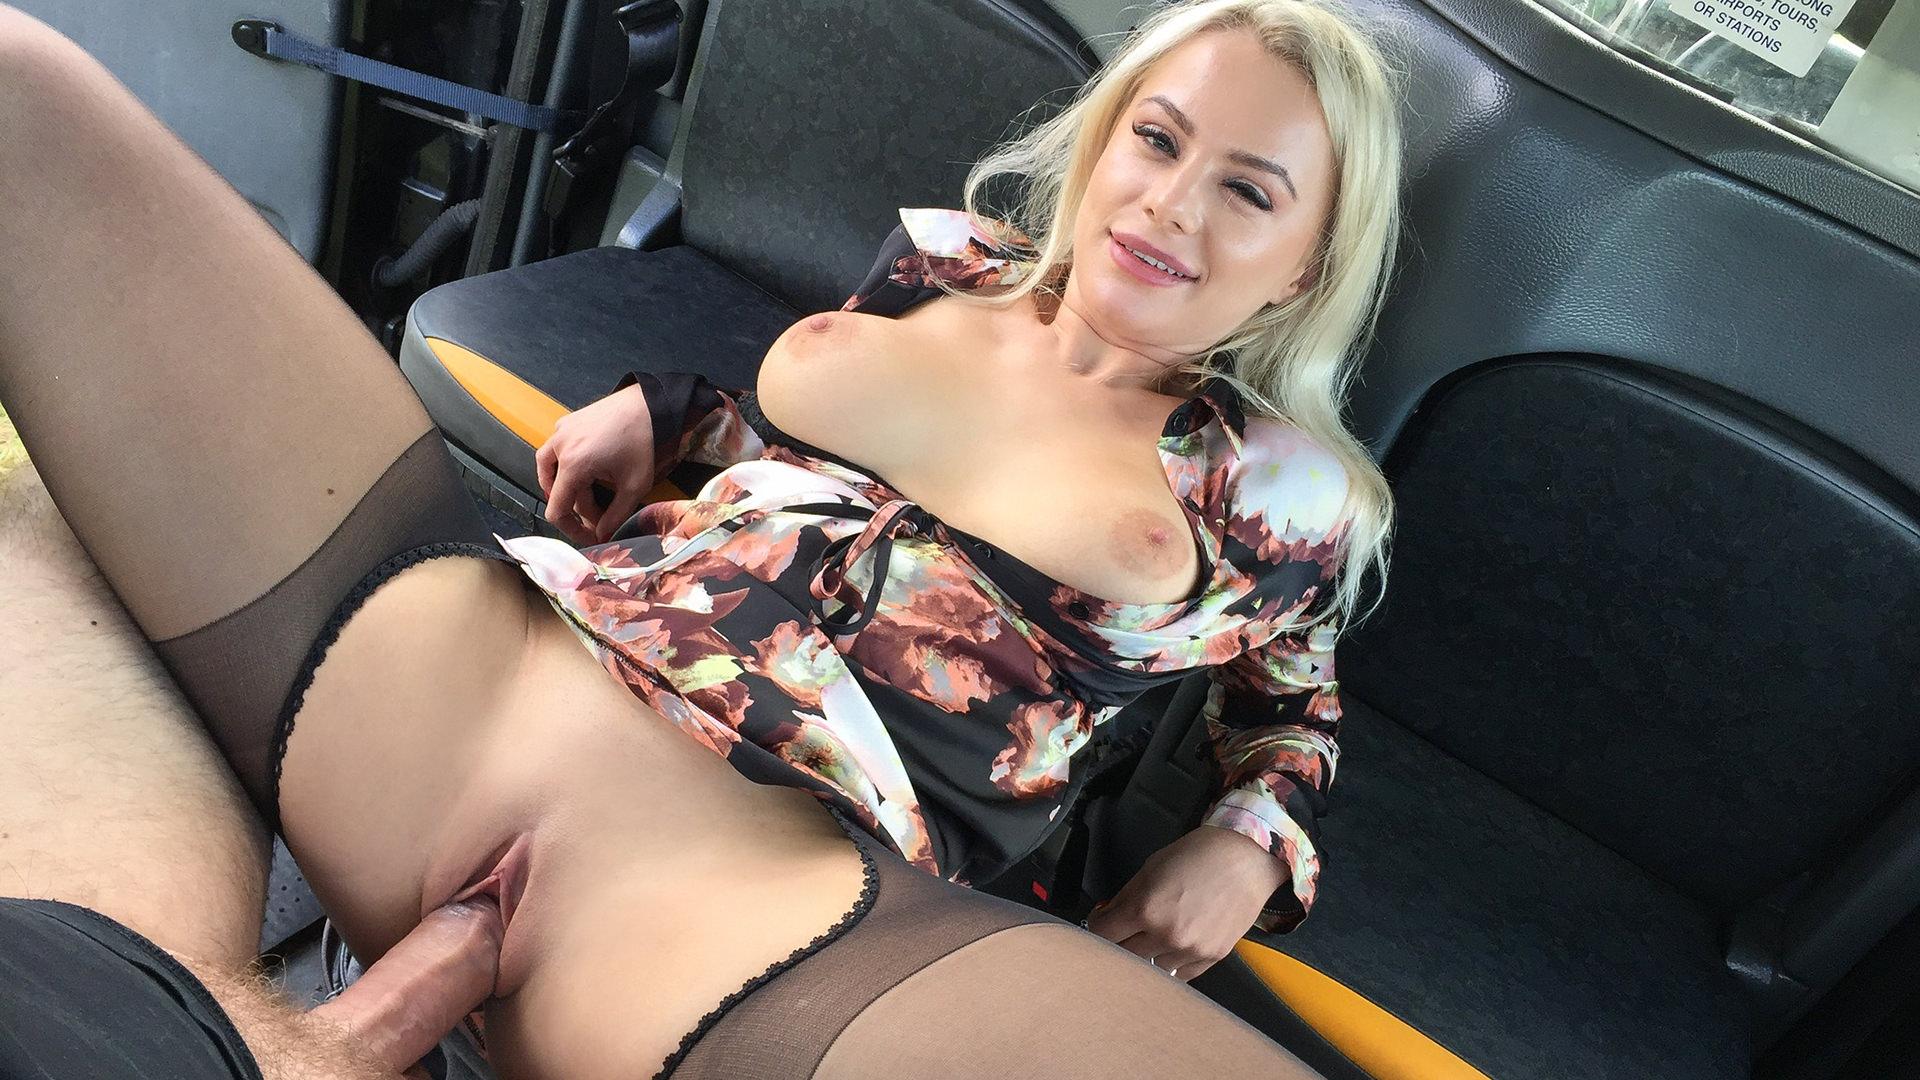 Polish blonde escort fucked - Fake Taxi